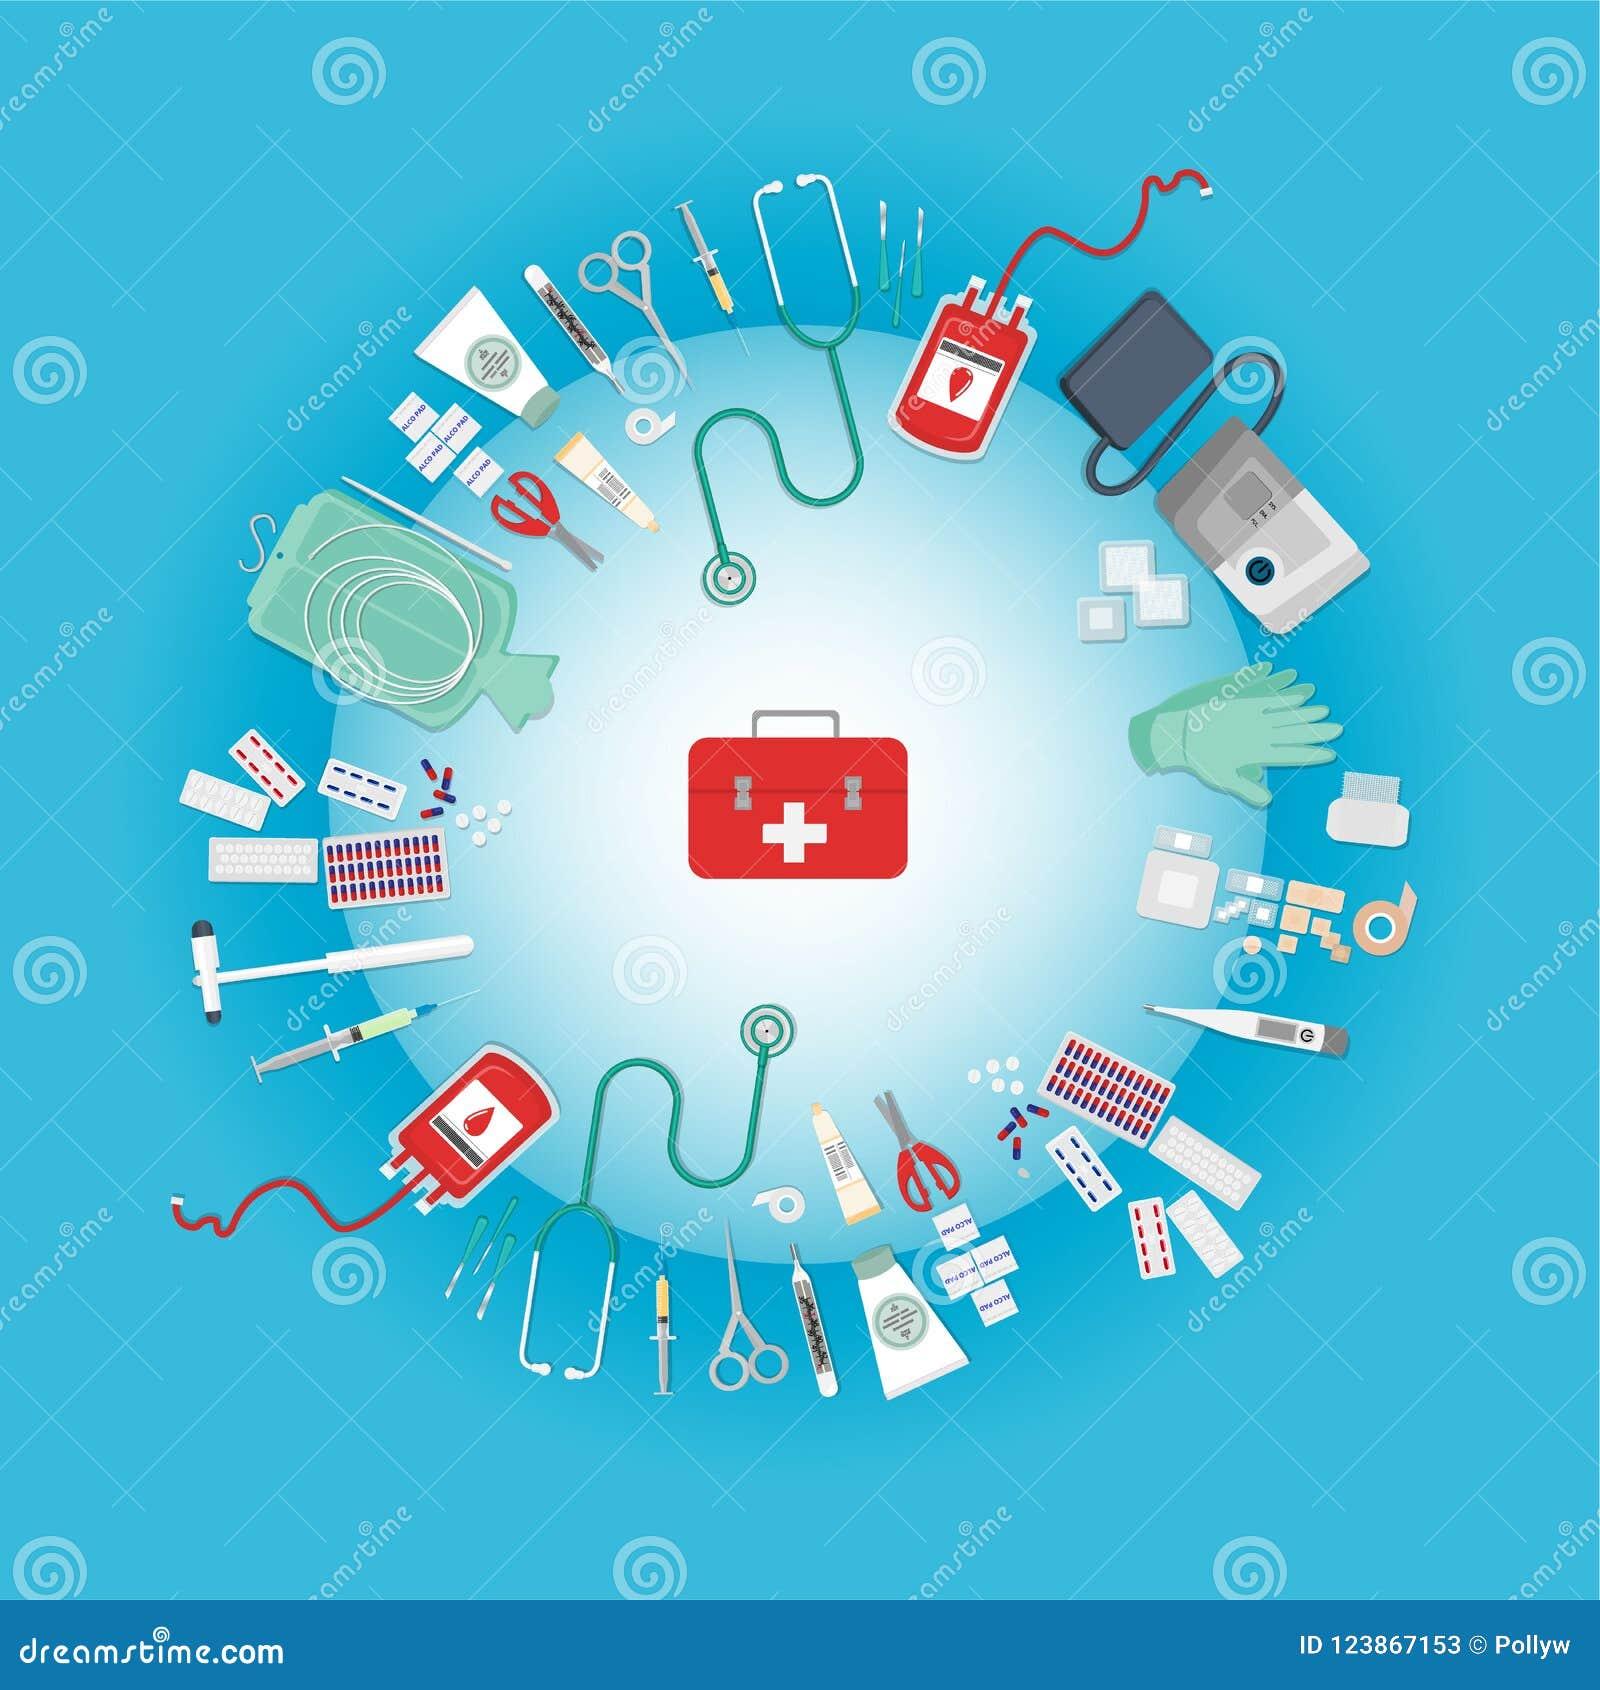 Medical Equipment Flat Web And Print Illustration Stock ...